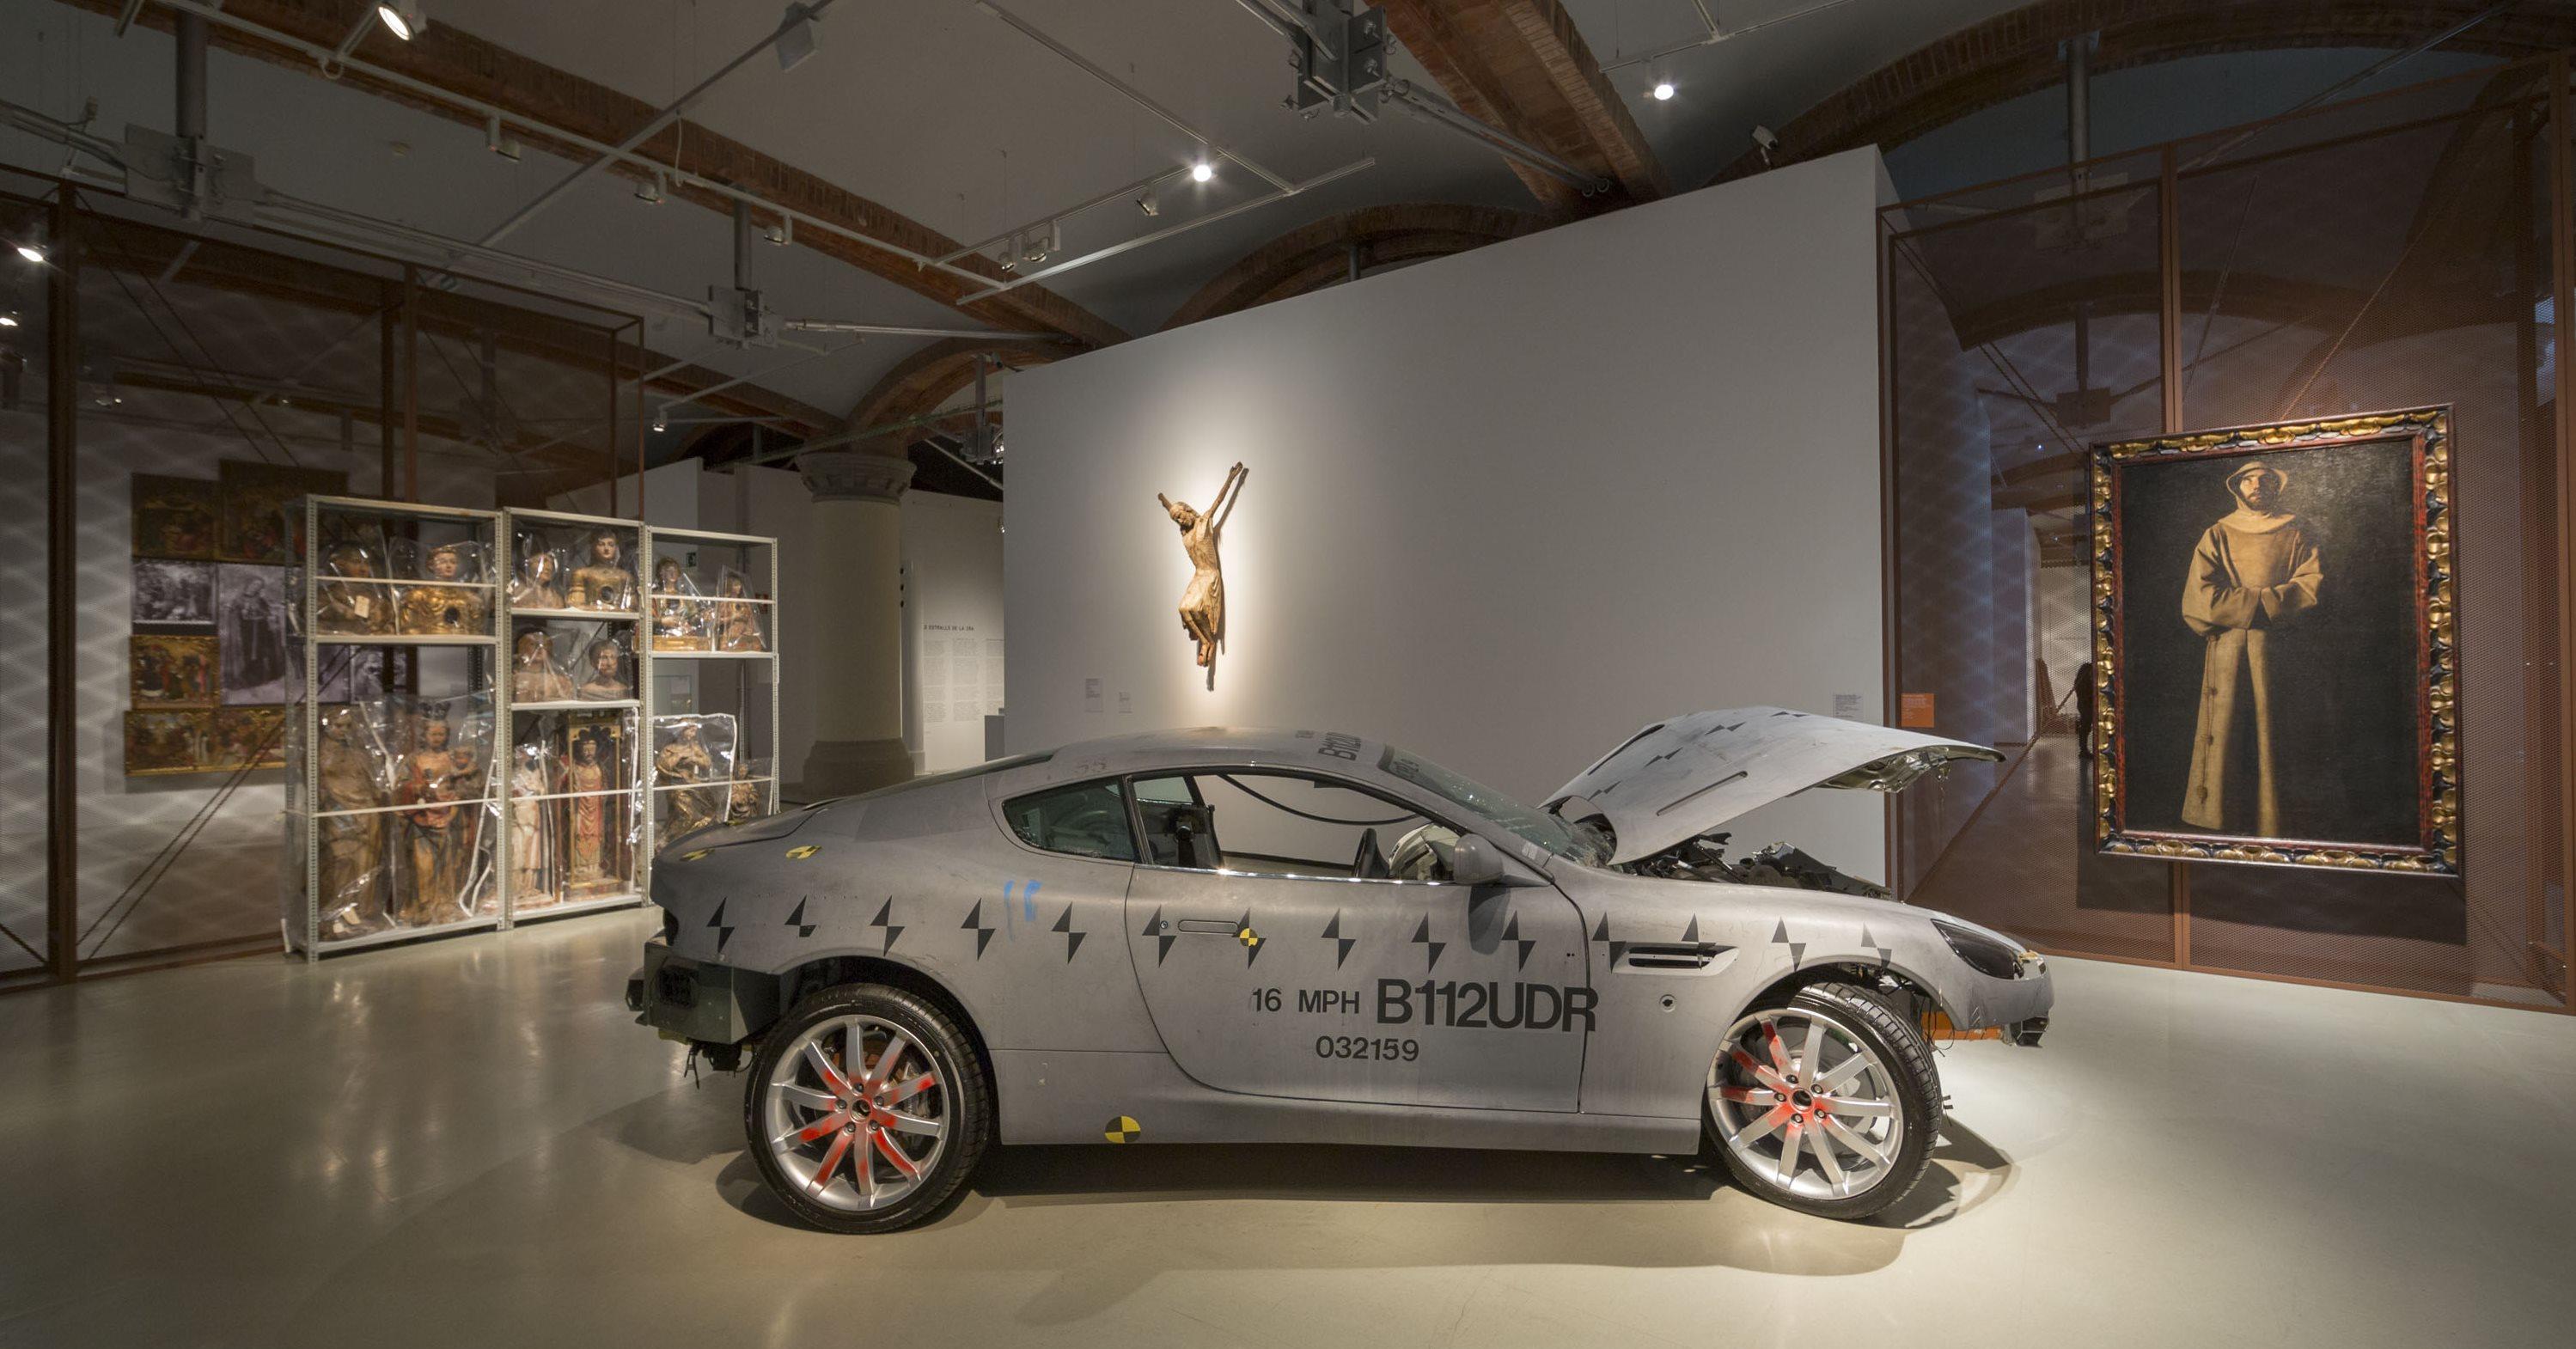 A breakthrough way of putting art in value, exhibition Francesc Torres